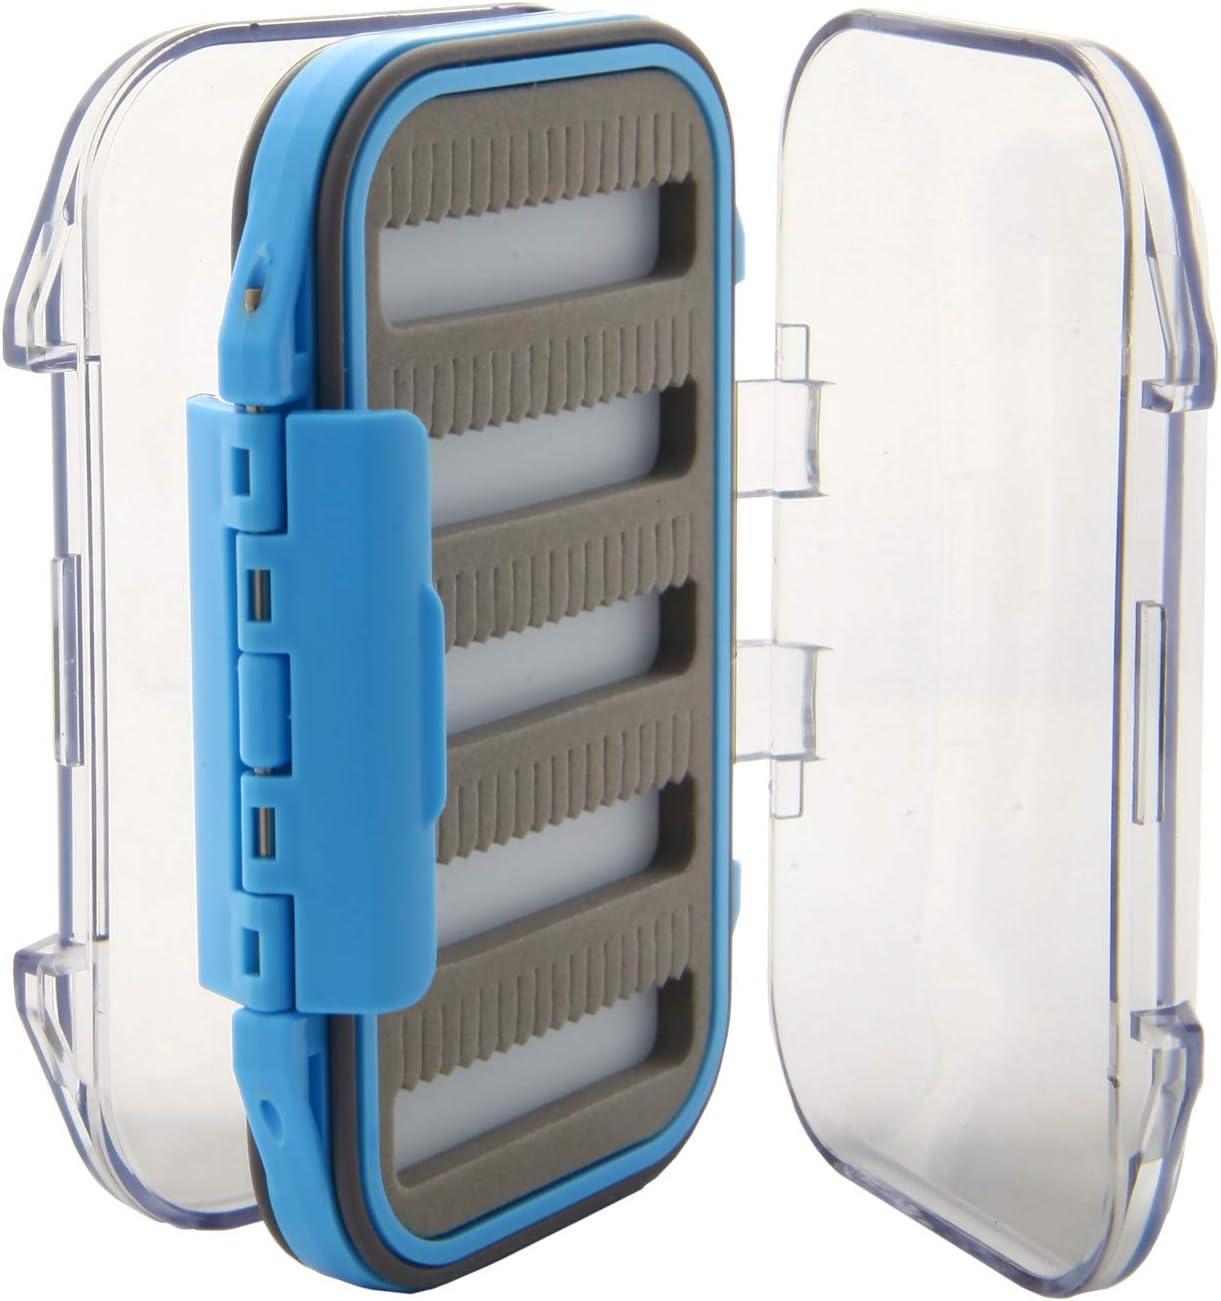 Regular dealer Blue Fly Box Waterproof Clear online shopping Lid Double-Sided